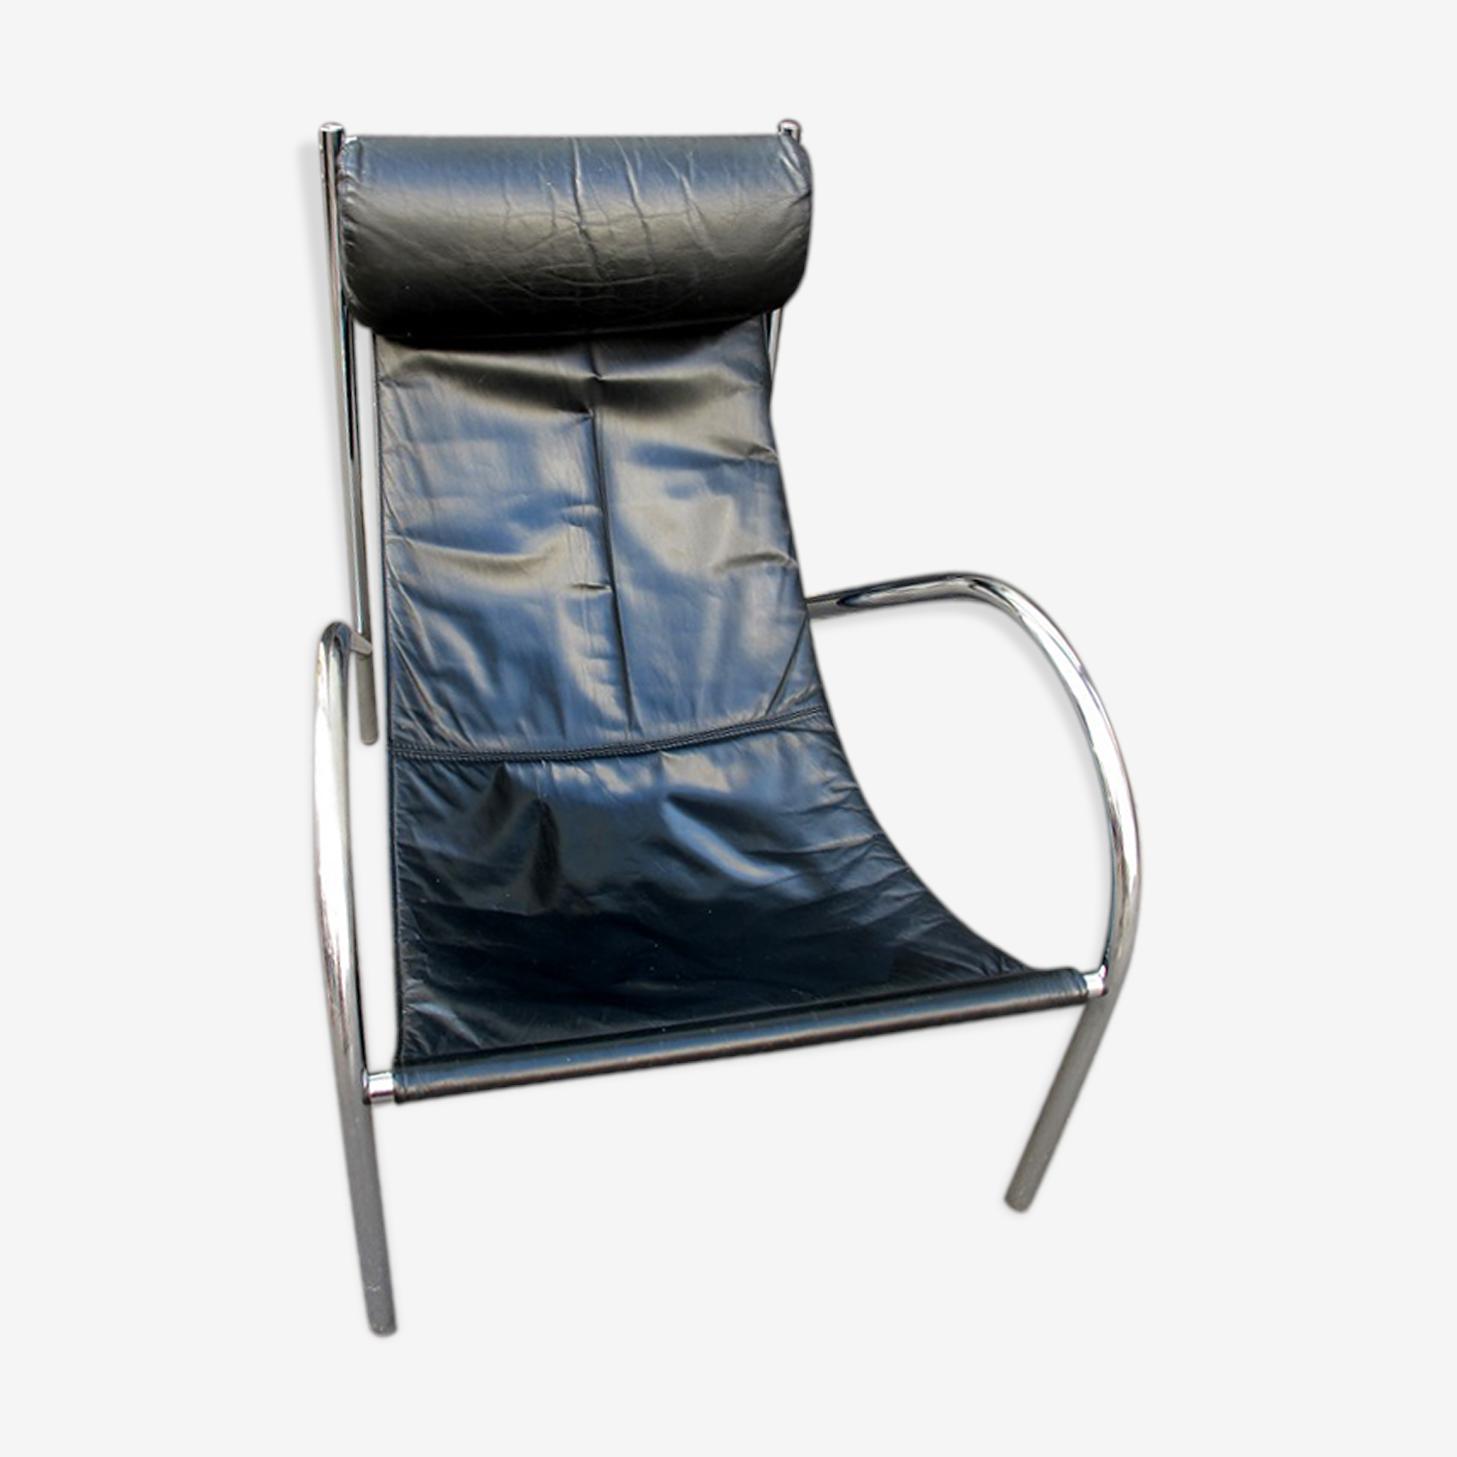 Fauteuil design 70 chaise longue chrome cuir tendu cuir noir